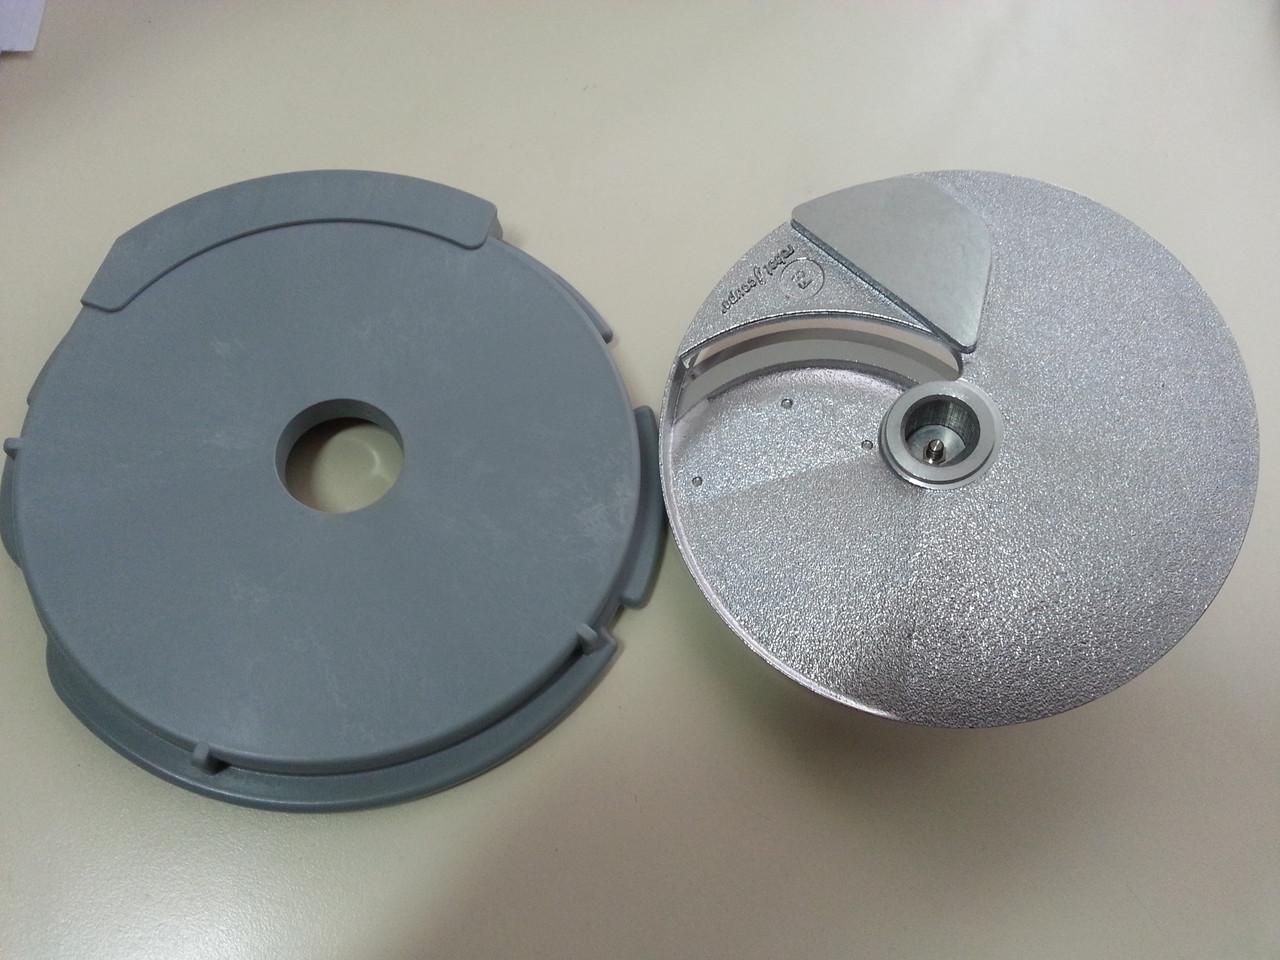 Диск F10 для овощерезки Robot Coupe CL30 соломка-фри 10x10 (27117)